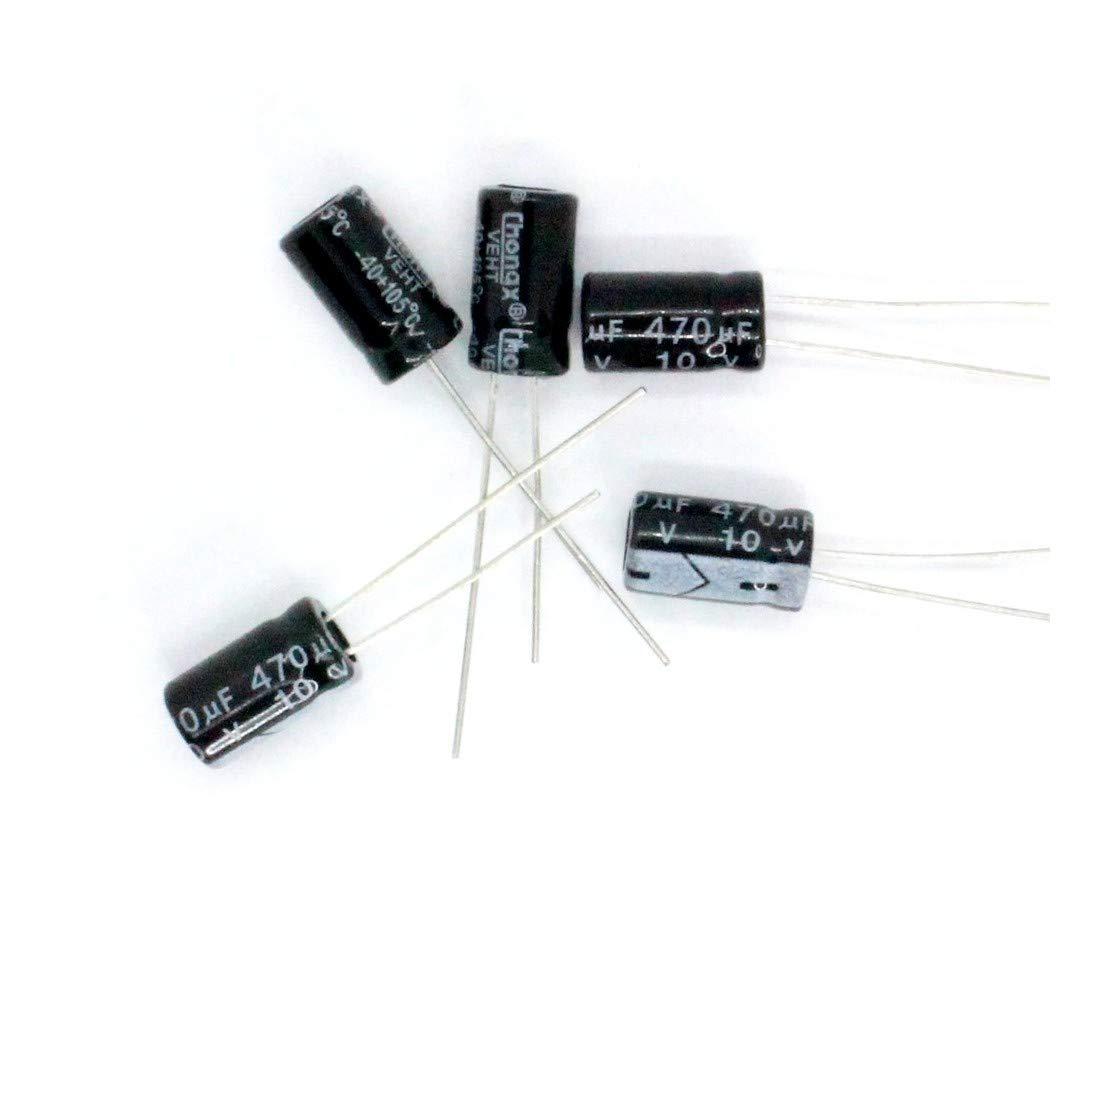 5x Condensateur chimique radial 470uF 10V 6x11mm 1con220